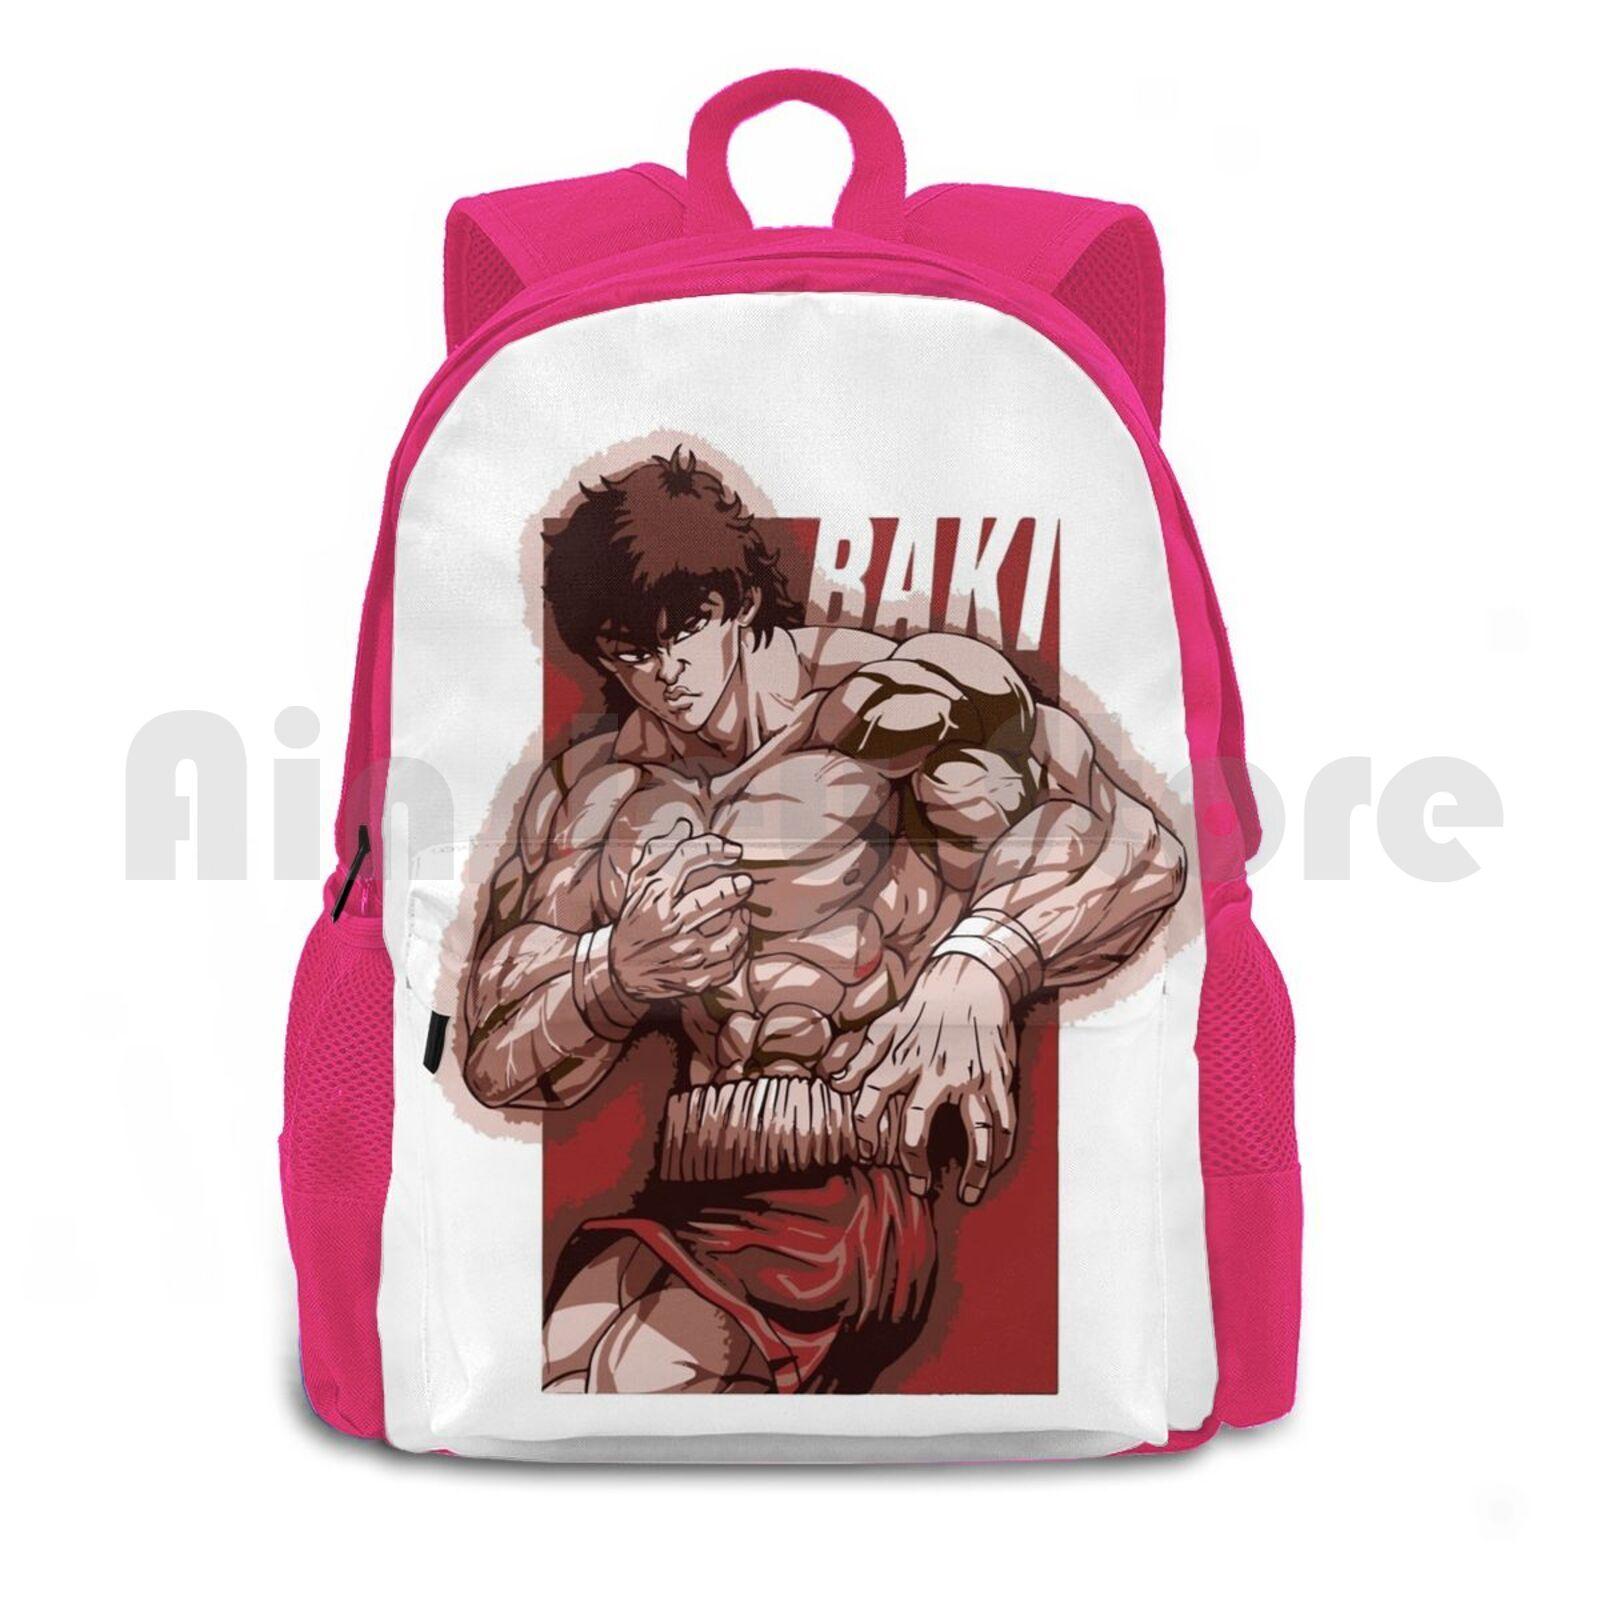 H2f33ae22395d4a3d8e10b0b215beea5dd - Anime Backpacks